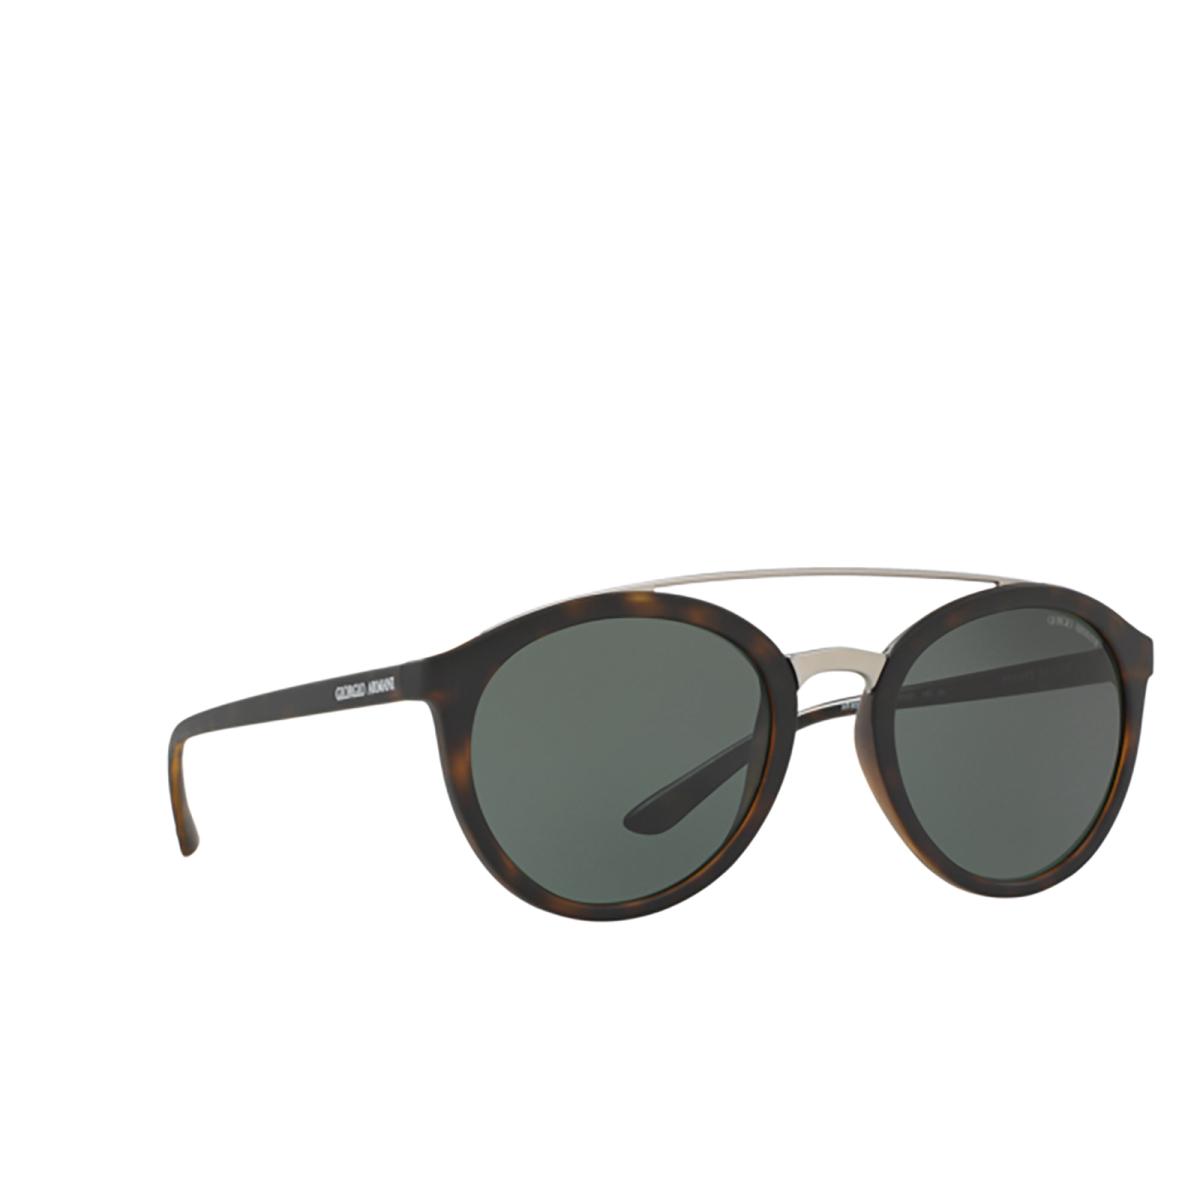 Giorgio Armani® Round Sunglasses: AR8083 color Matte Dark Havana 508971 - three-quarters view.